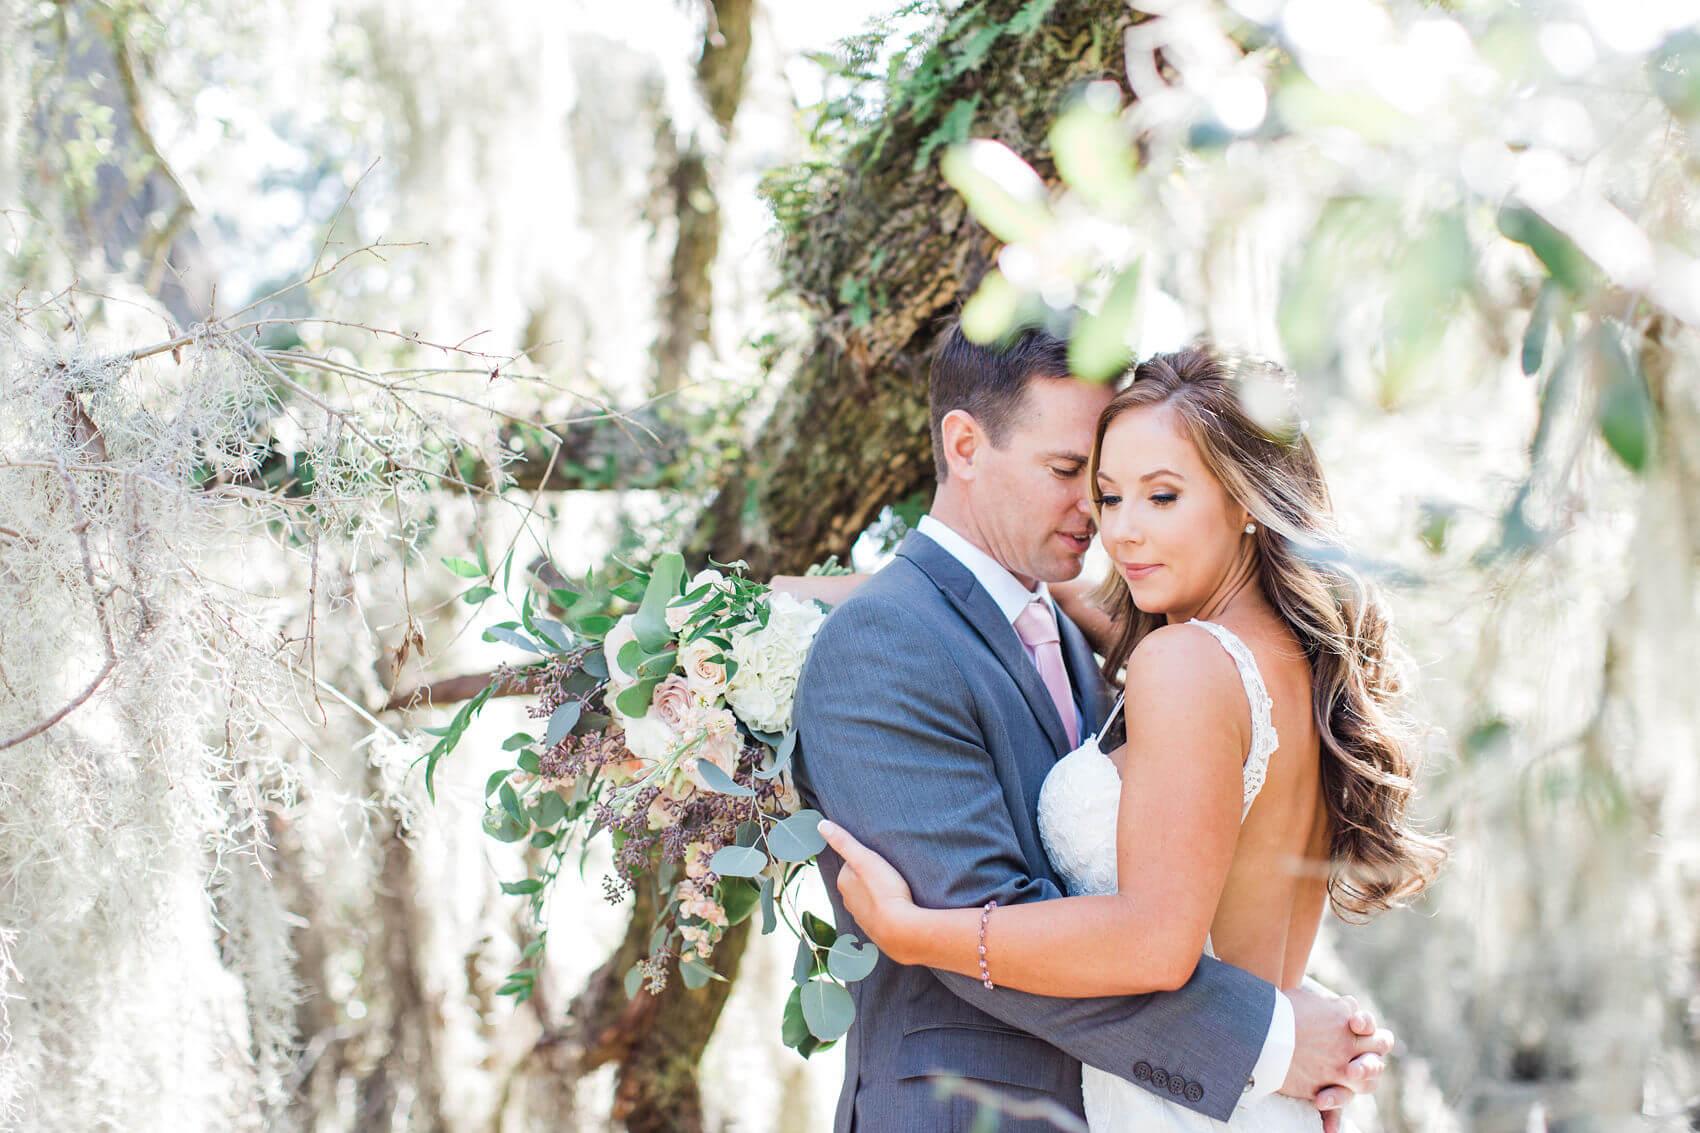 Apt-b-photography-savannah-wedding-photographer-savannah-wedding-hilton-head-wedding-photographer-15.jpg